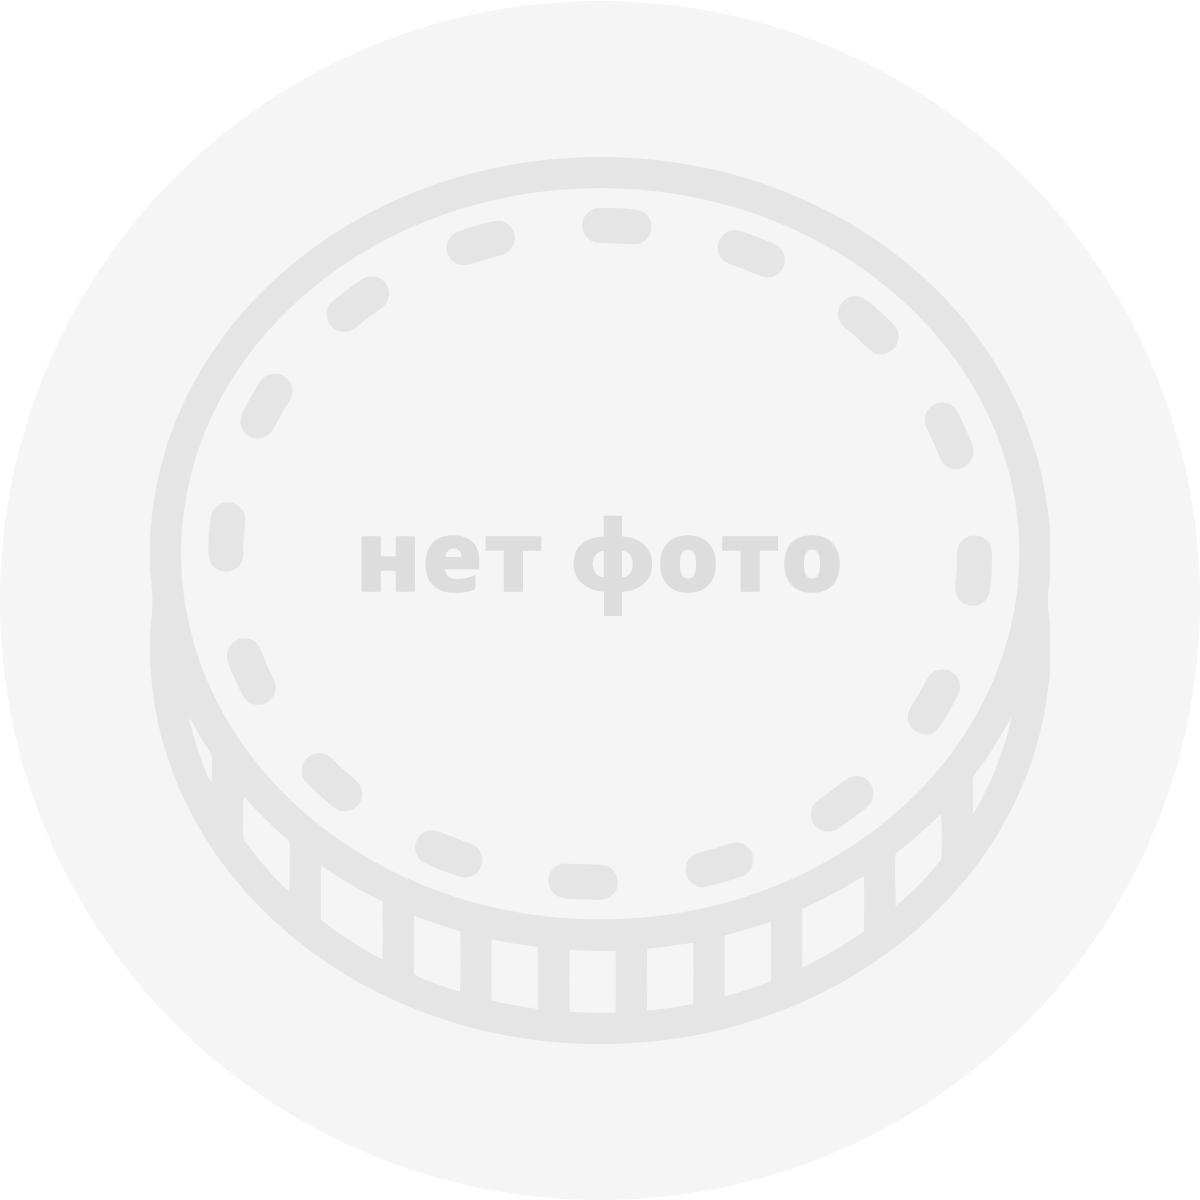 500 марок 1923 года цена sovmint ru